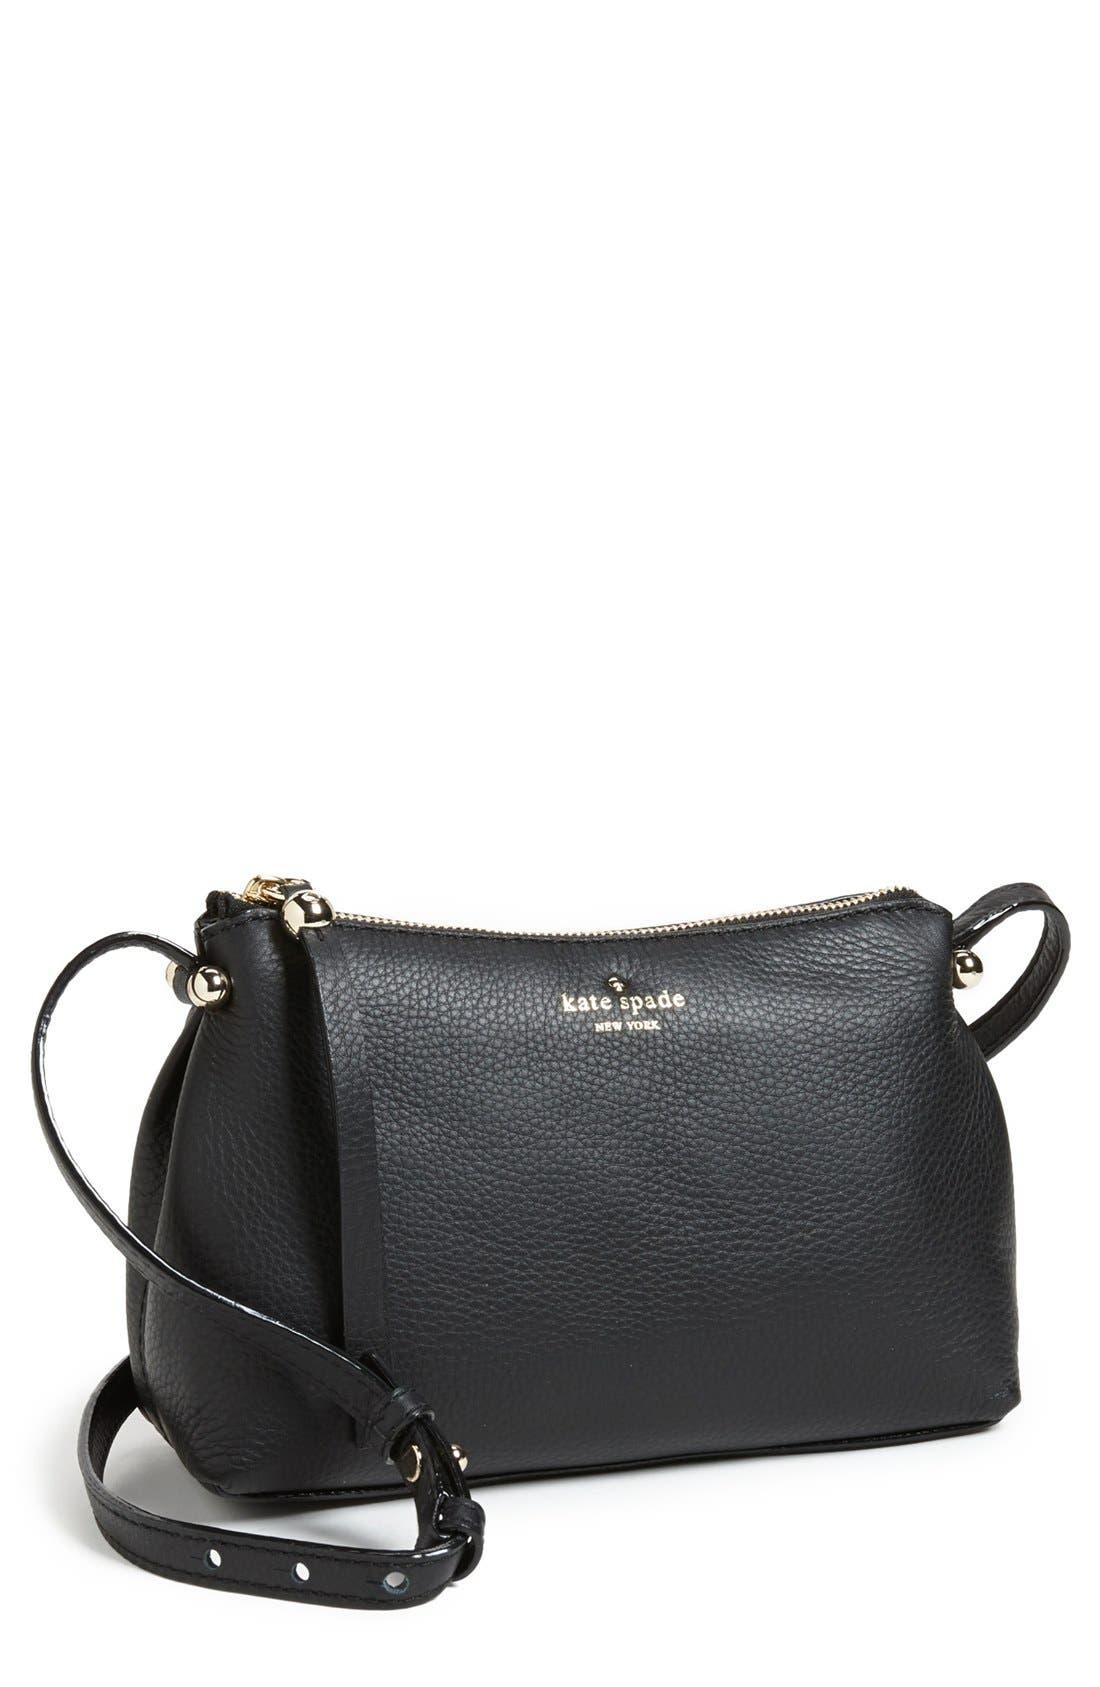 Main Image - kate spade new york 'claudie' leather crossbody bag